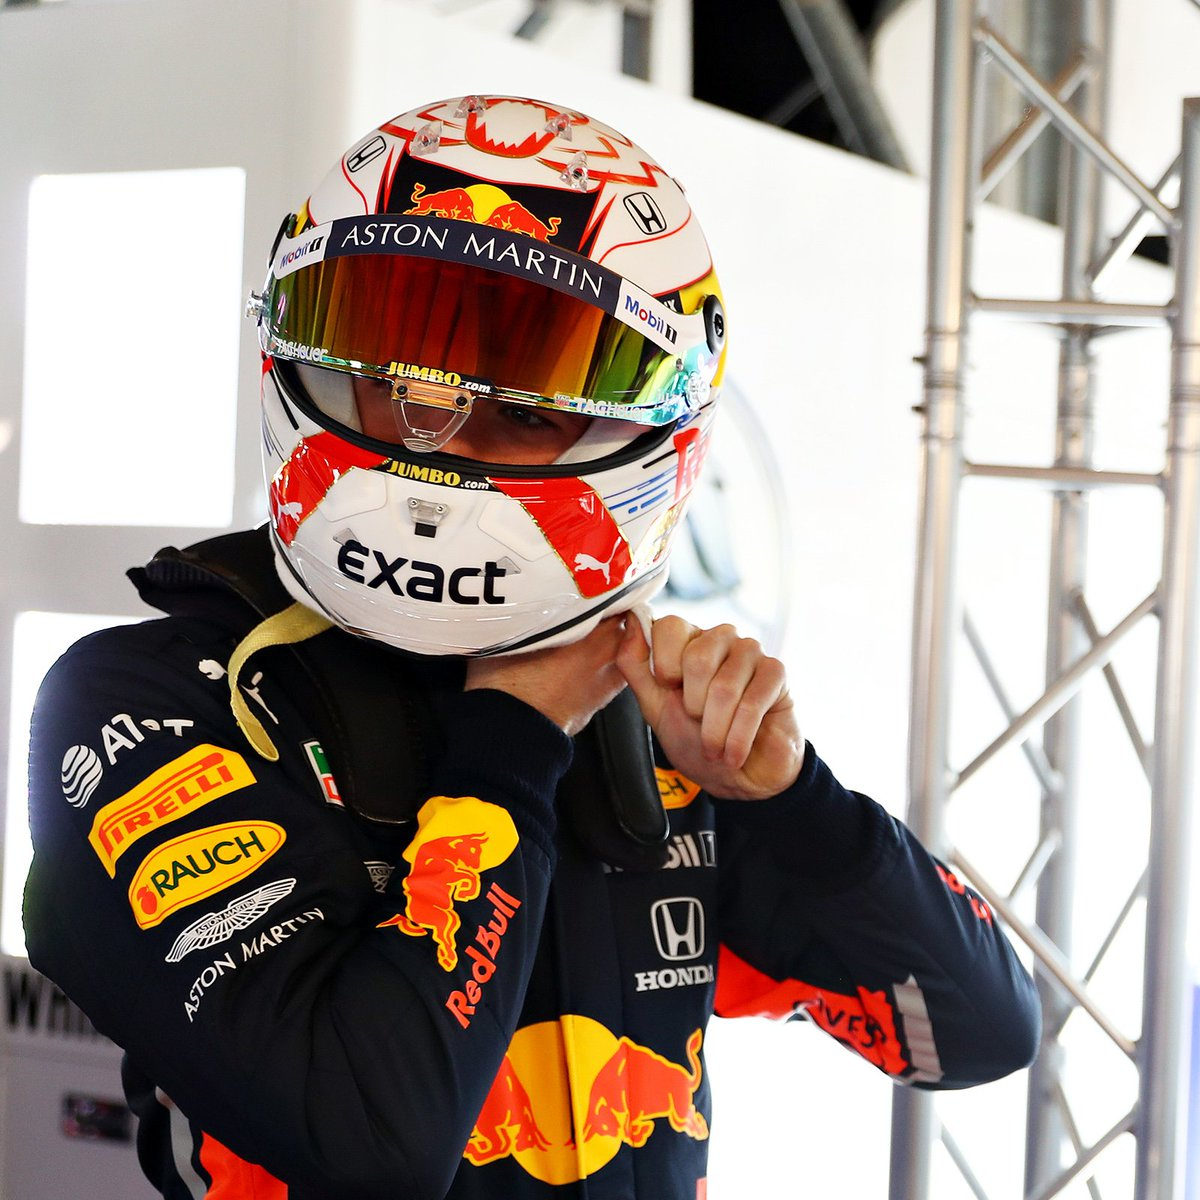 Max Verstappen @Max33Verstappen